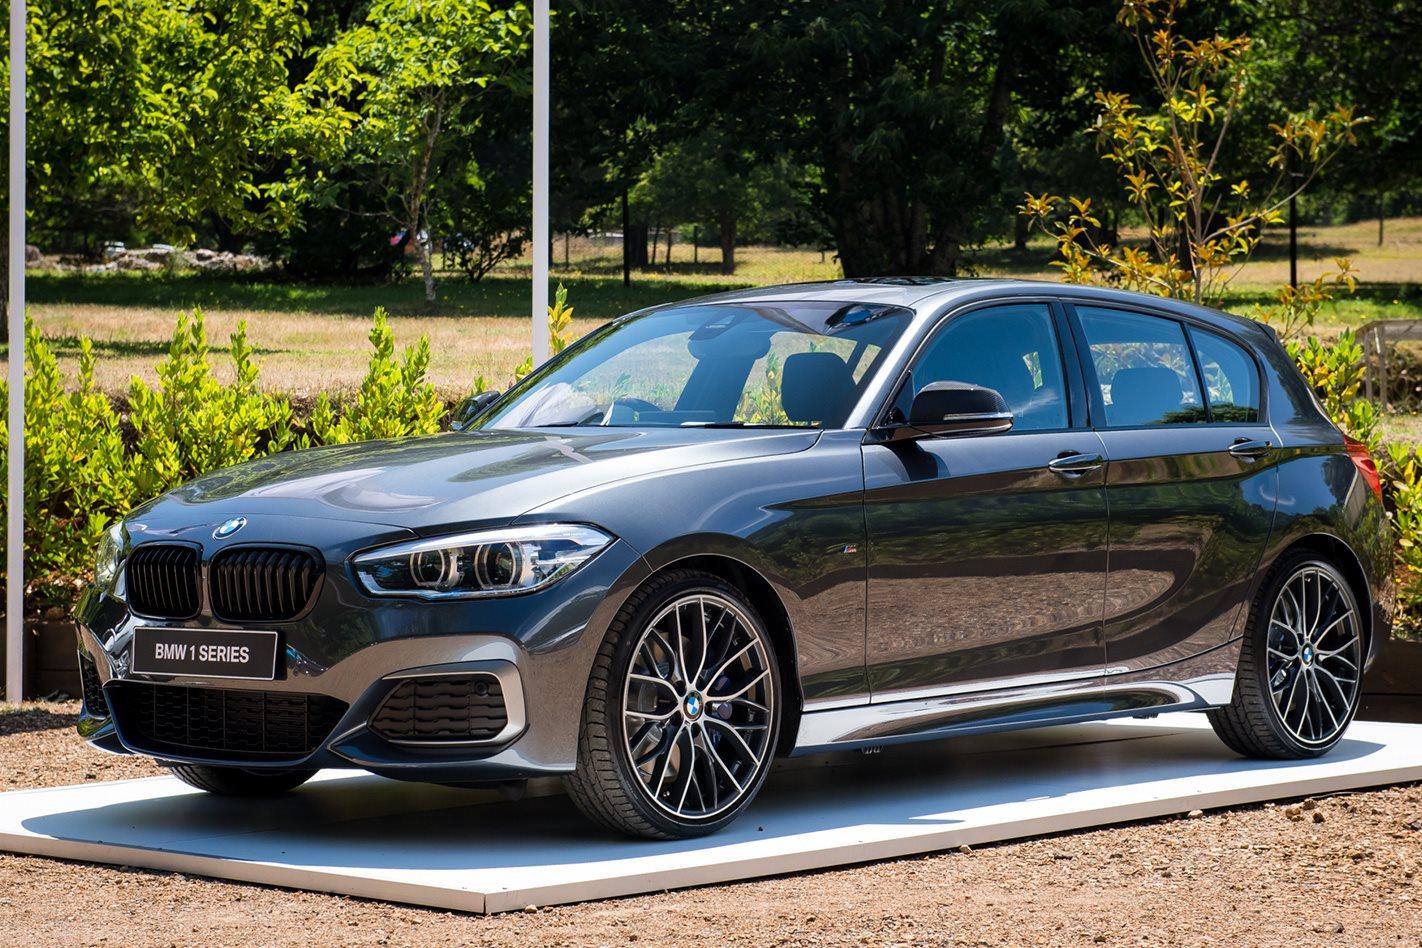 Kia Stinger Price In Rands >> BMW M140i Performance Edition revealed